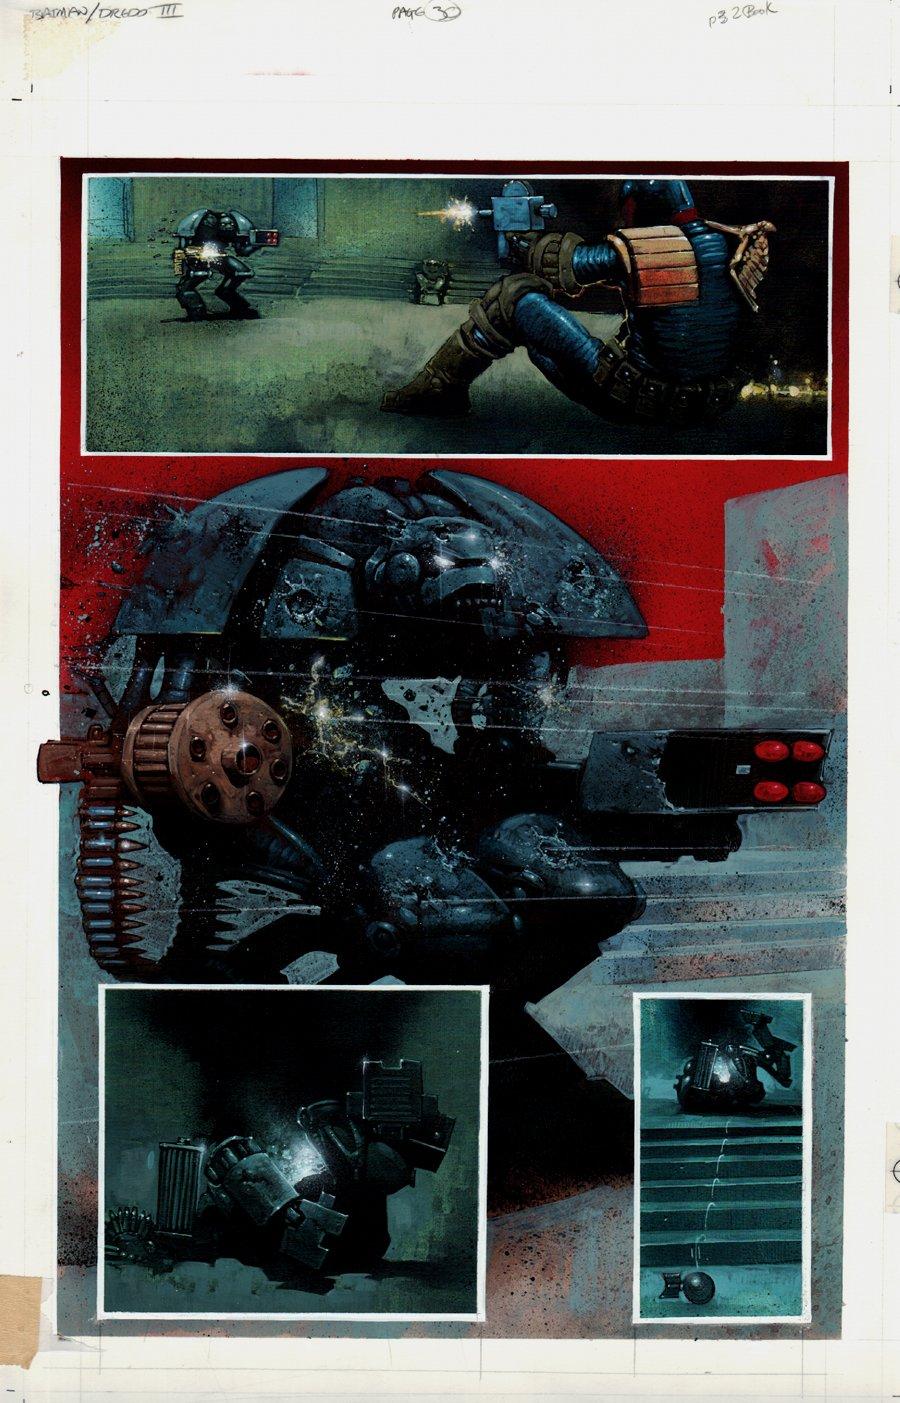 Batman / Judge Dredd: The Ultimate Riddle #1 p 30 Painted Art (1995)